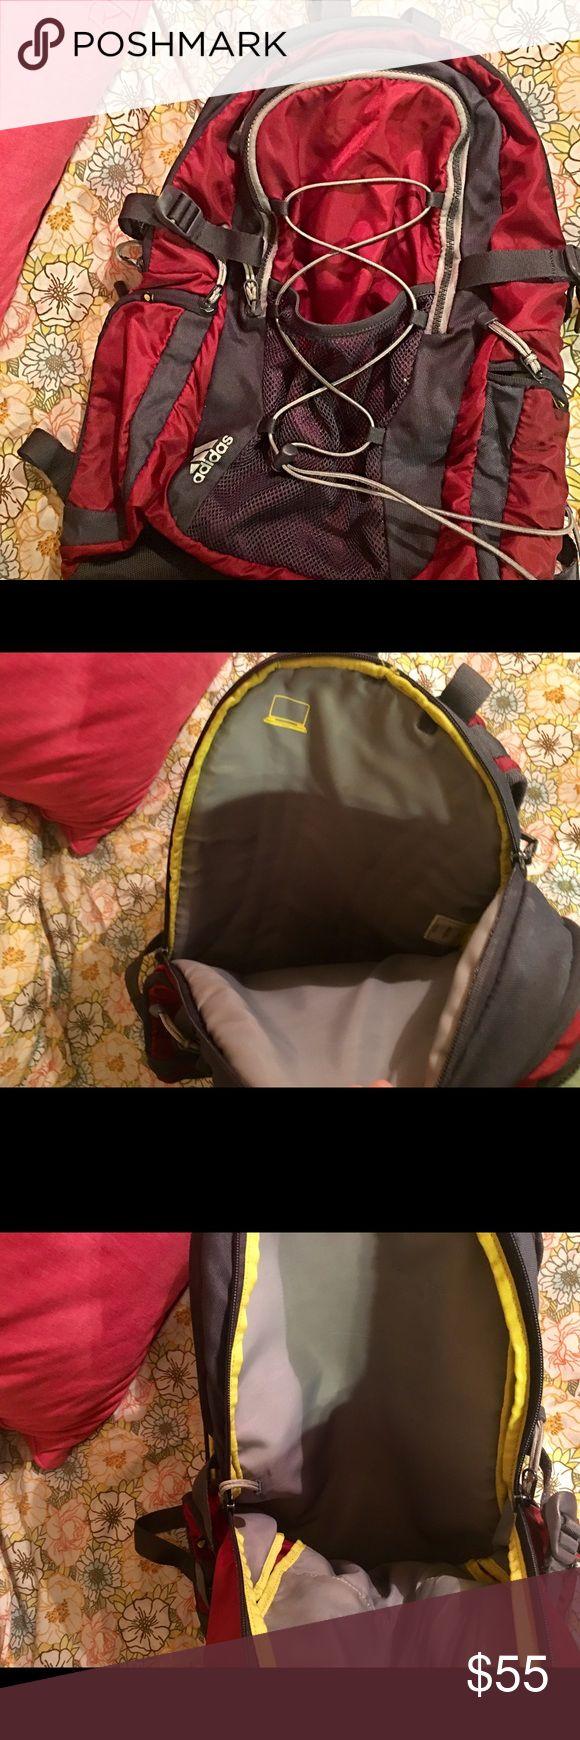 Adidas Formotion backpack Like new adidas formotio…